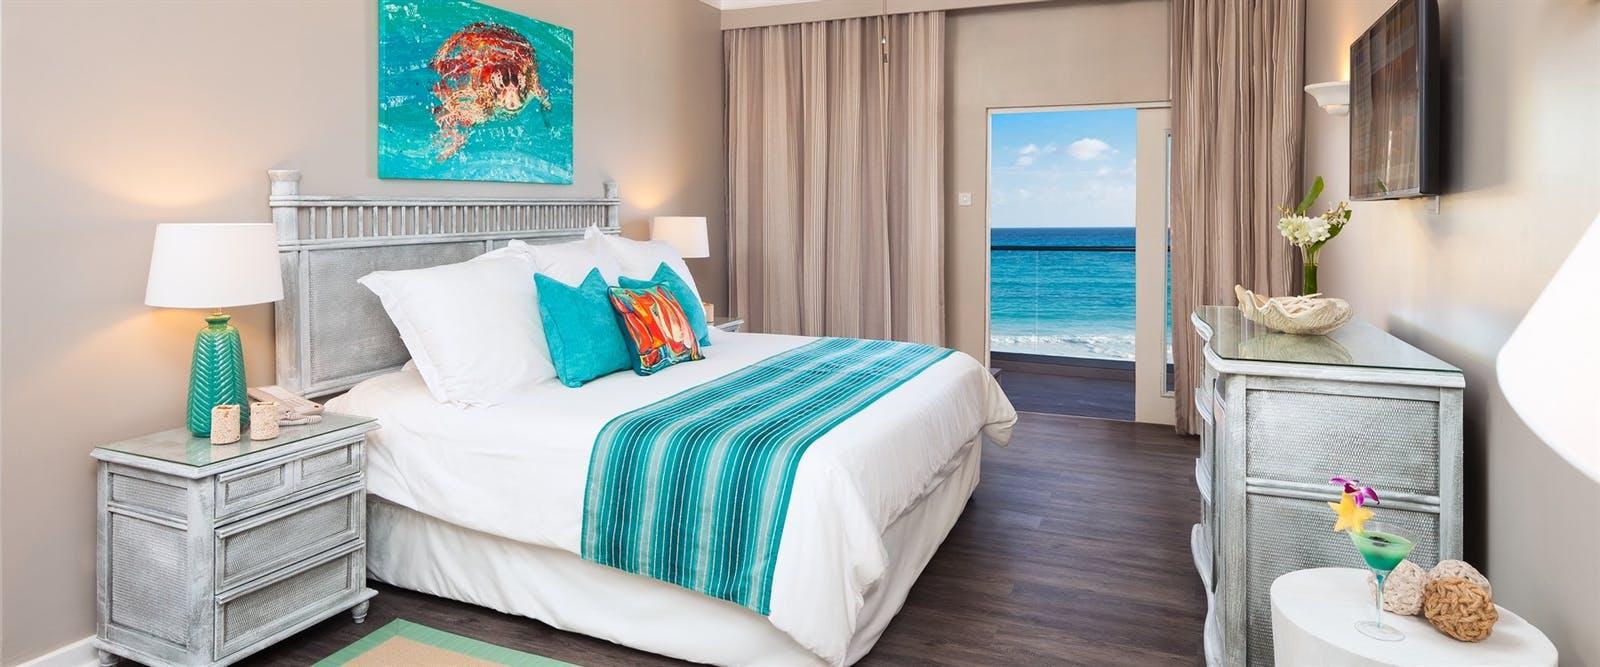 Rooms: Sea Breeze Beach House Luxury Resort In Barbados